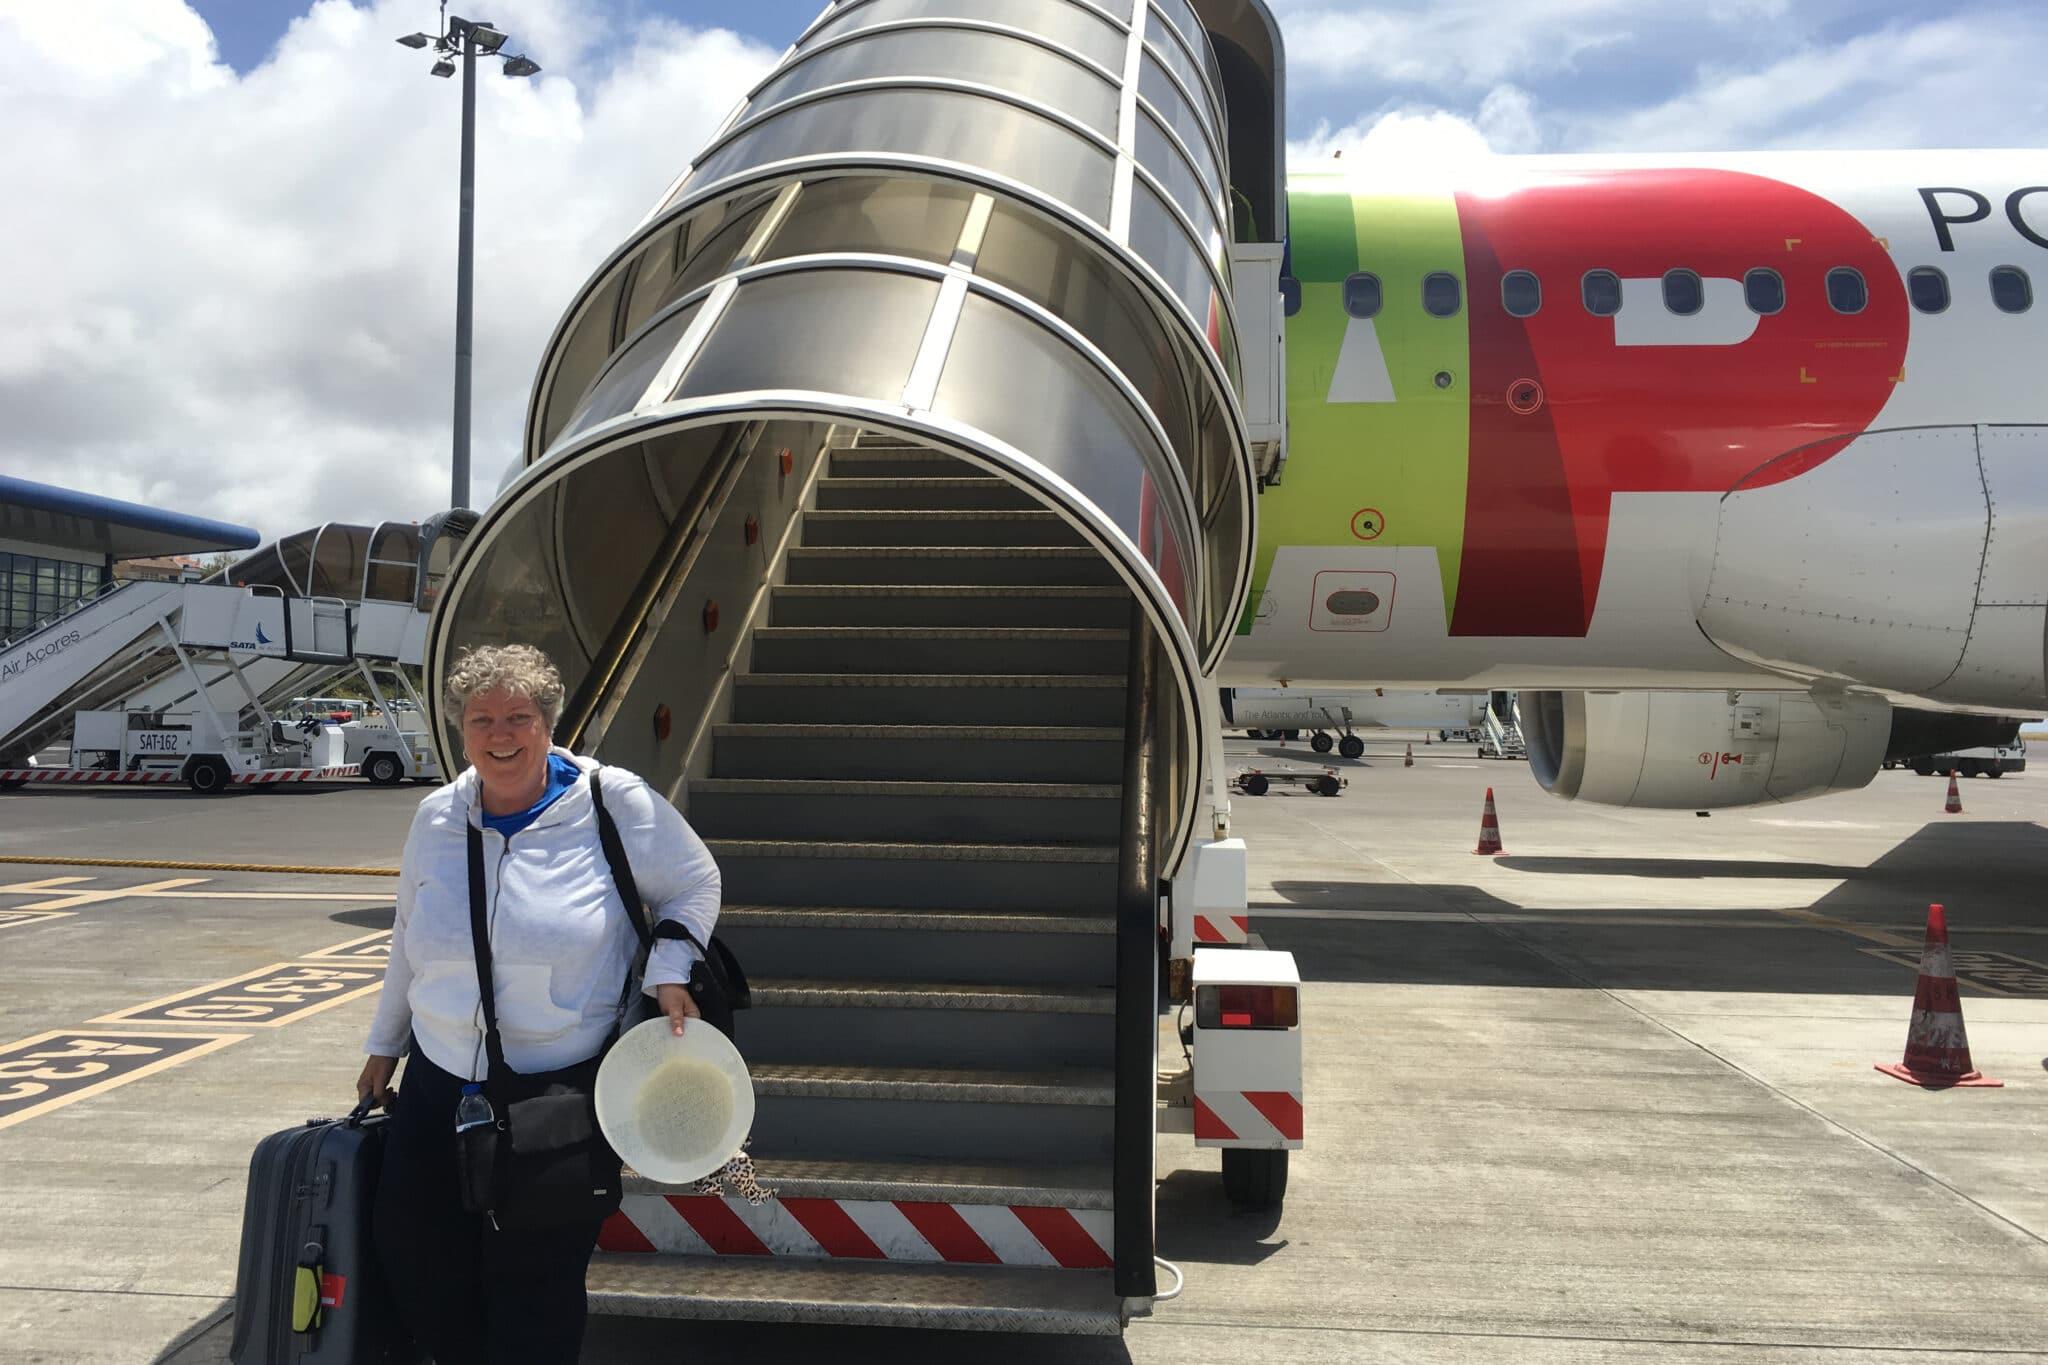 TAP Portugal Flight - Explore Sao Miguel From Ponta Delgada.jpg